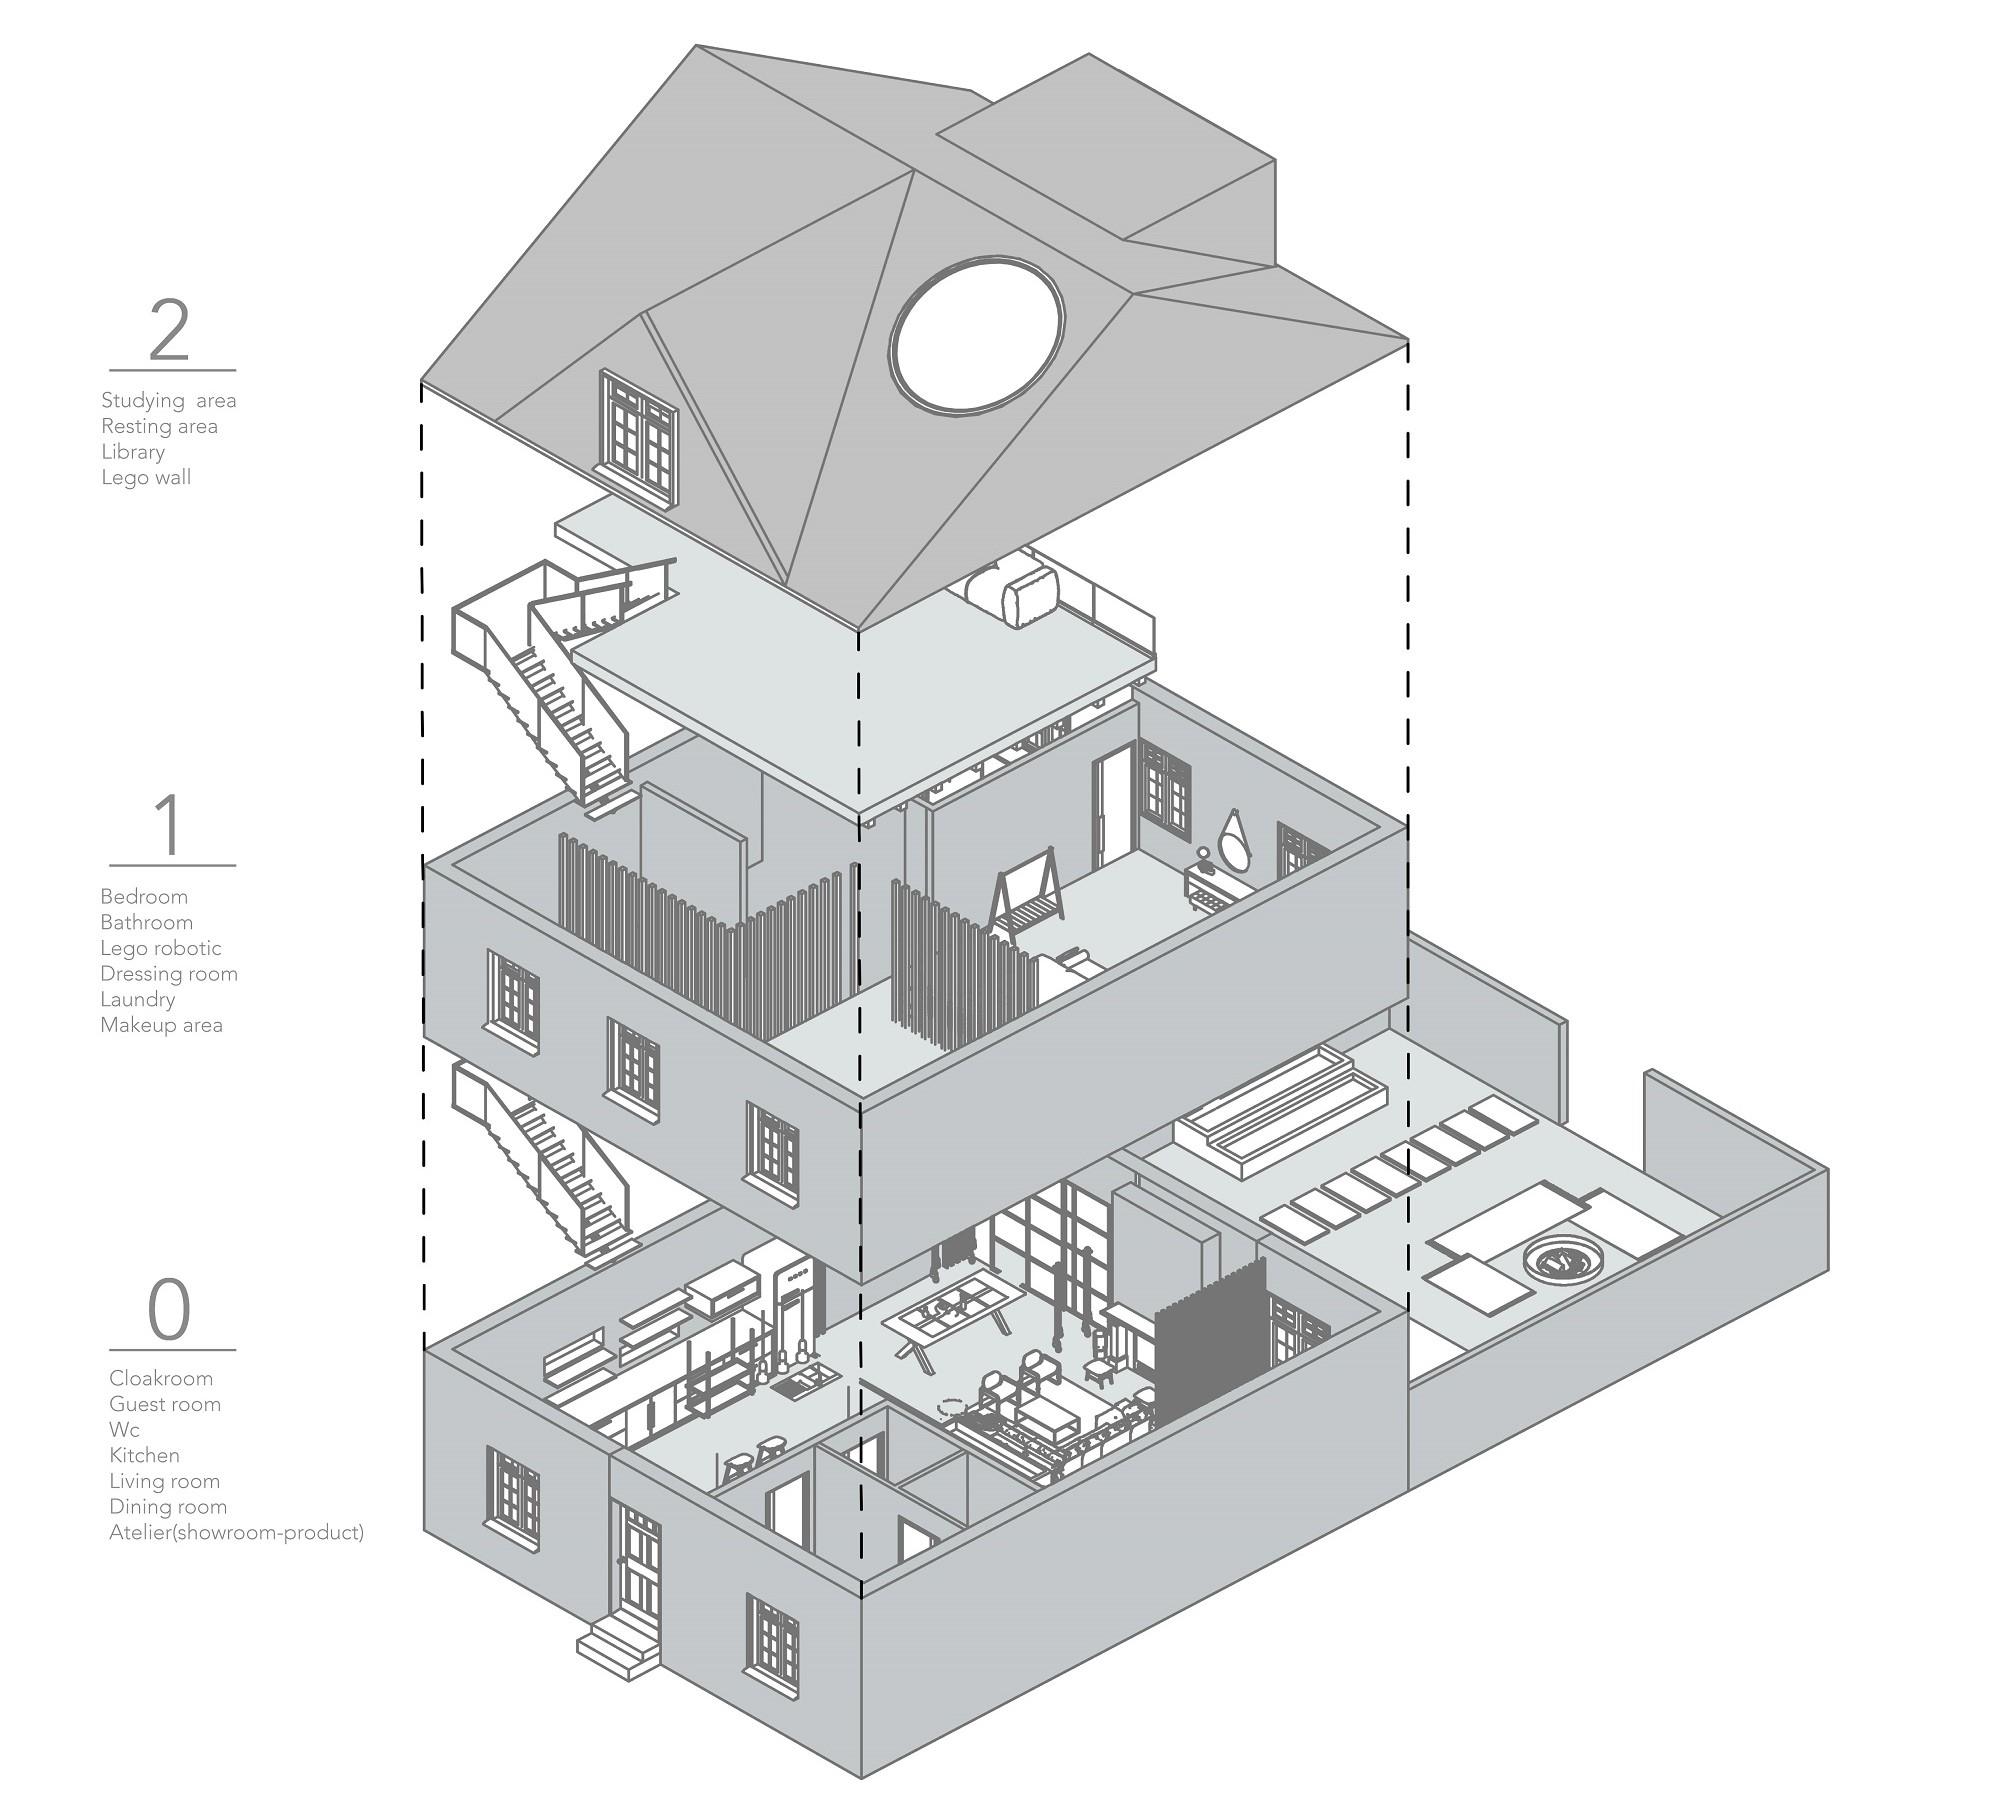 Olufsvej House / Simge Sezer